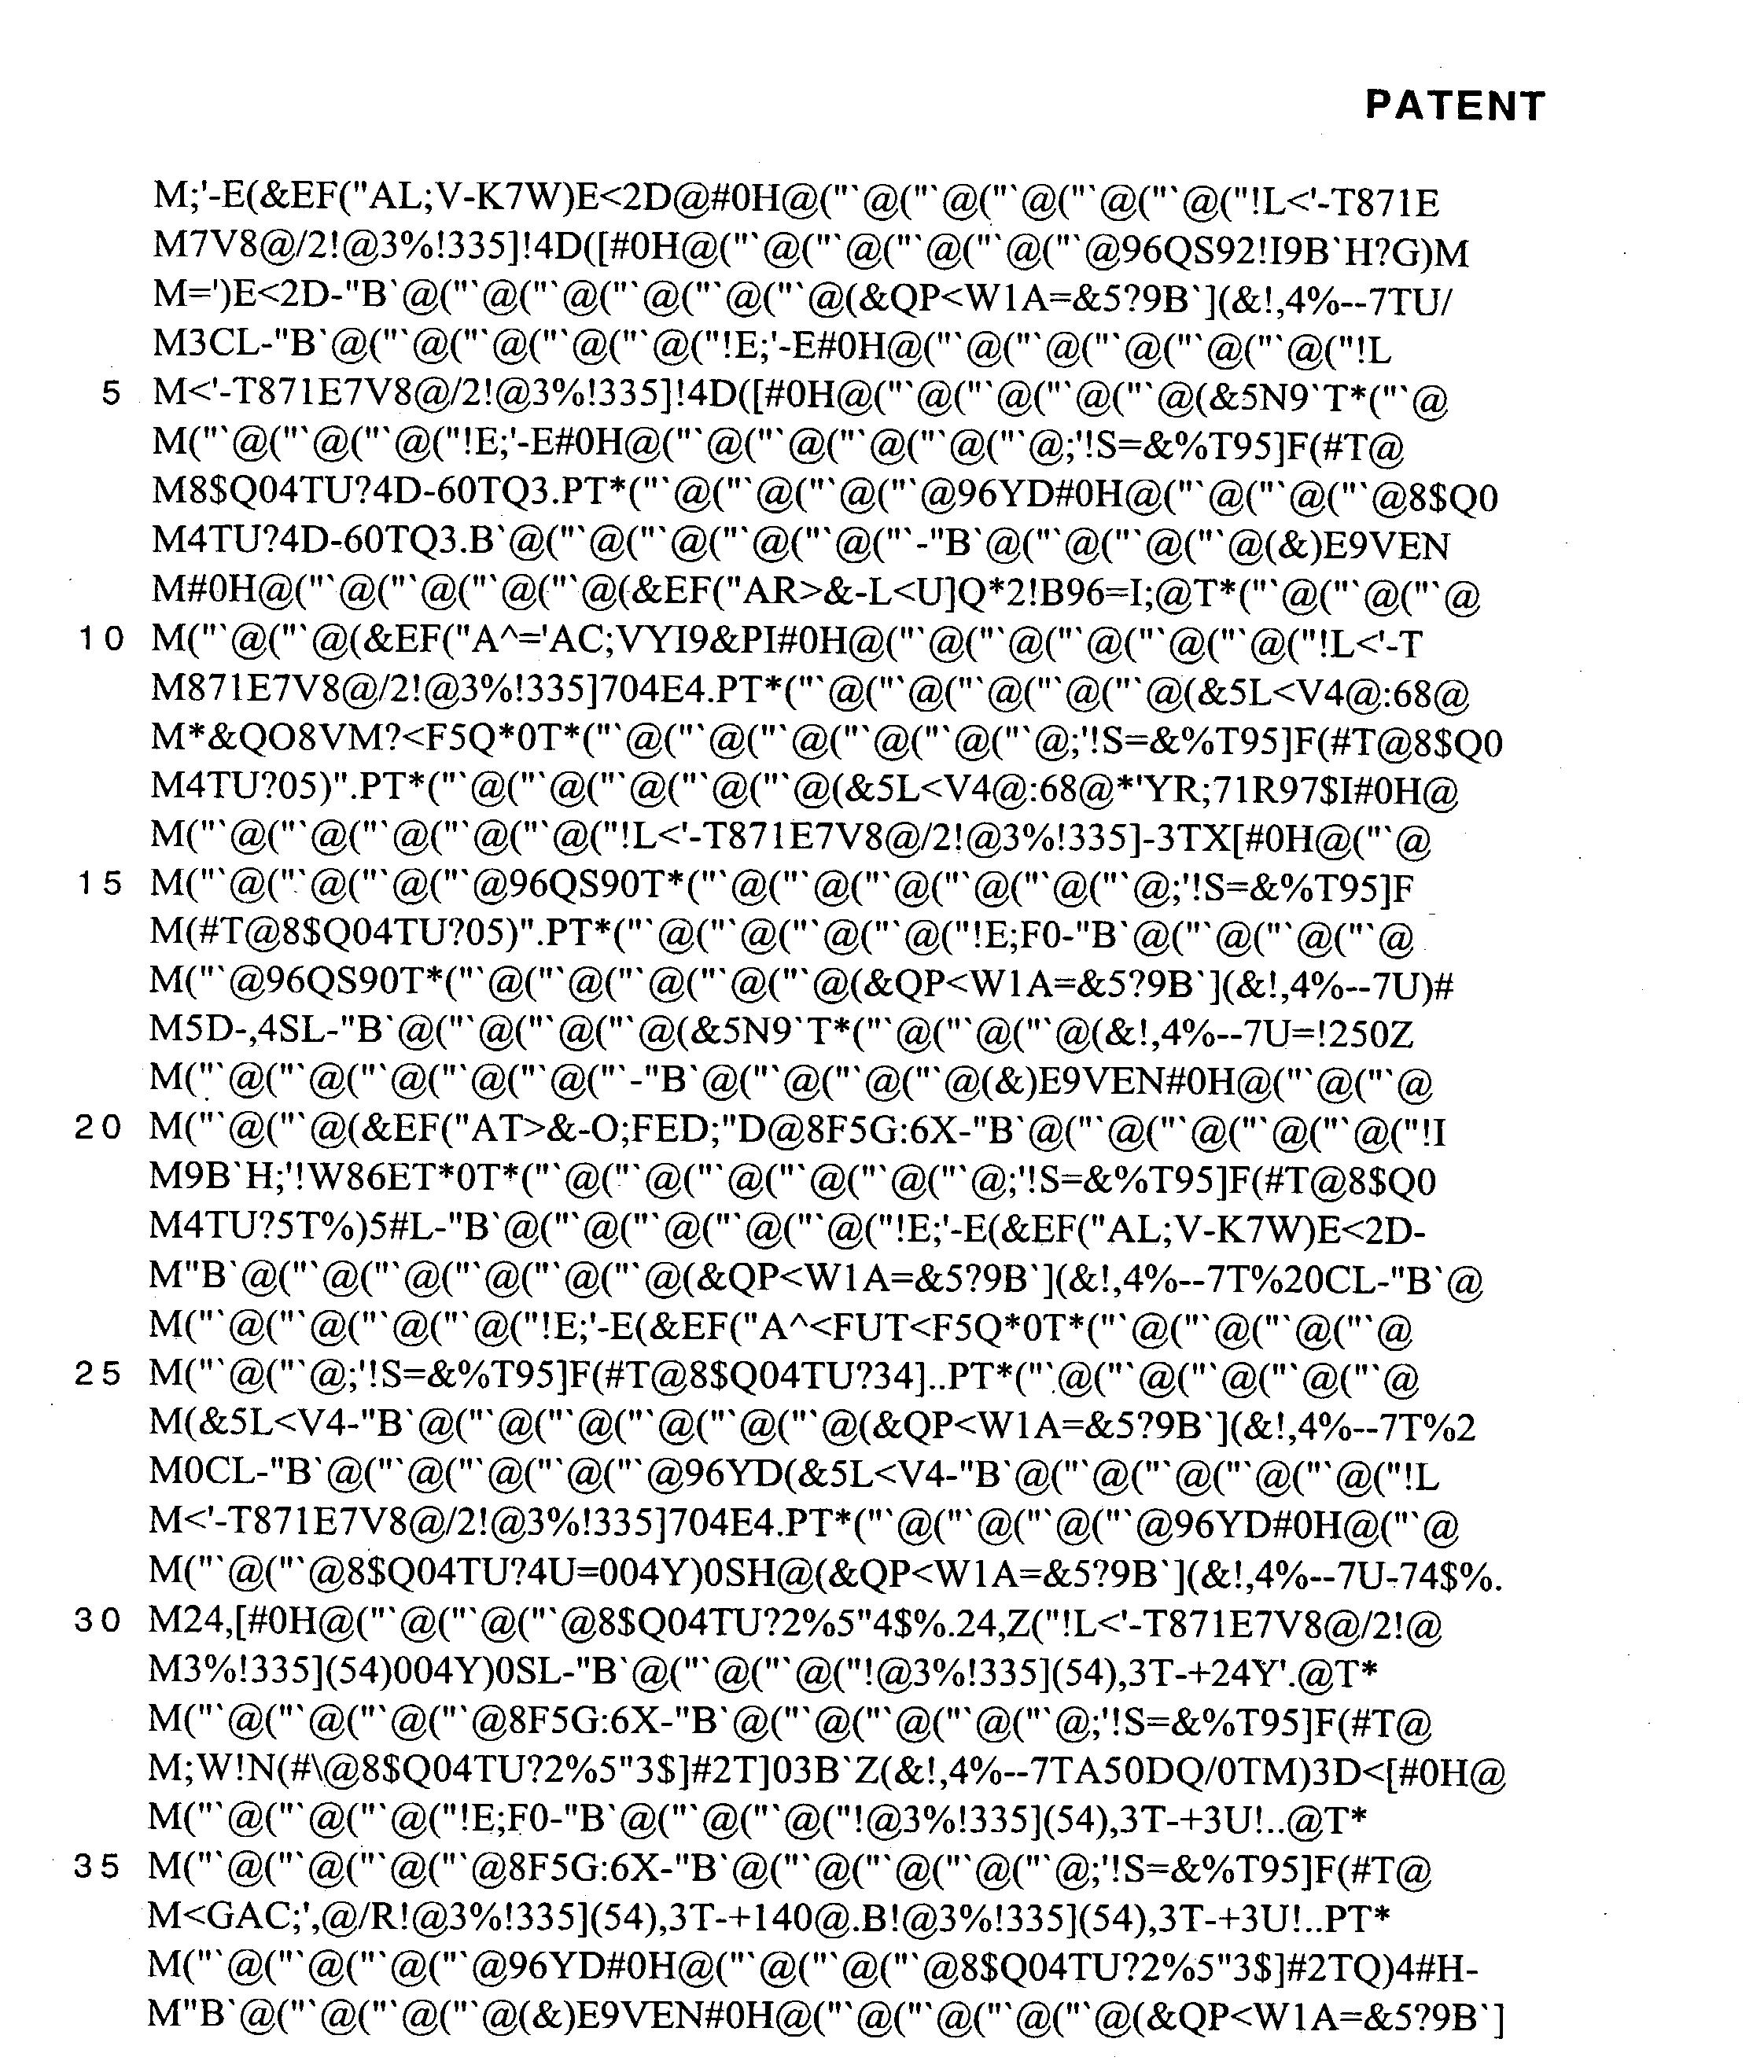 Figure US20030174720A1-20030918-P00025